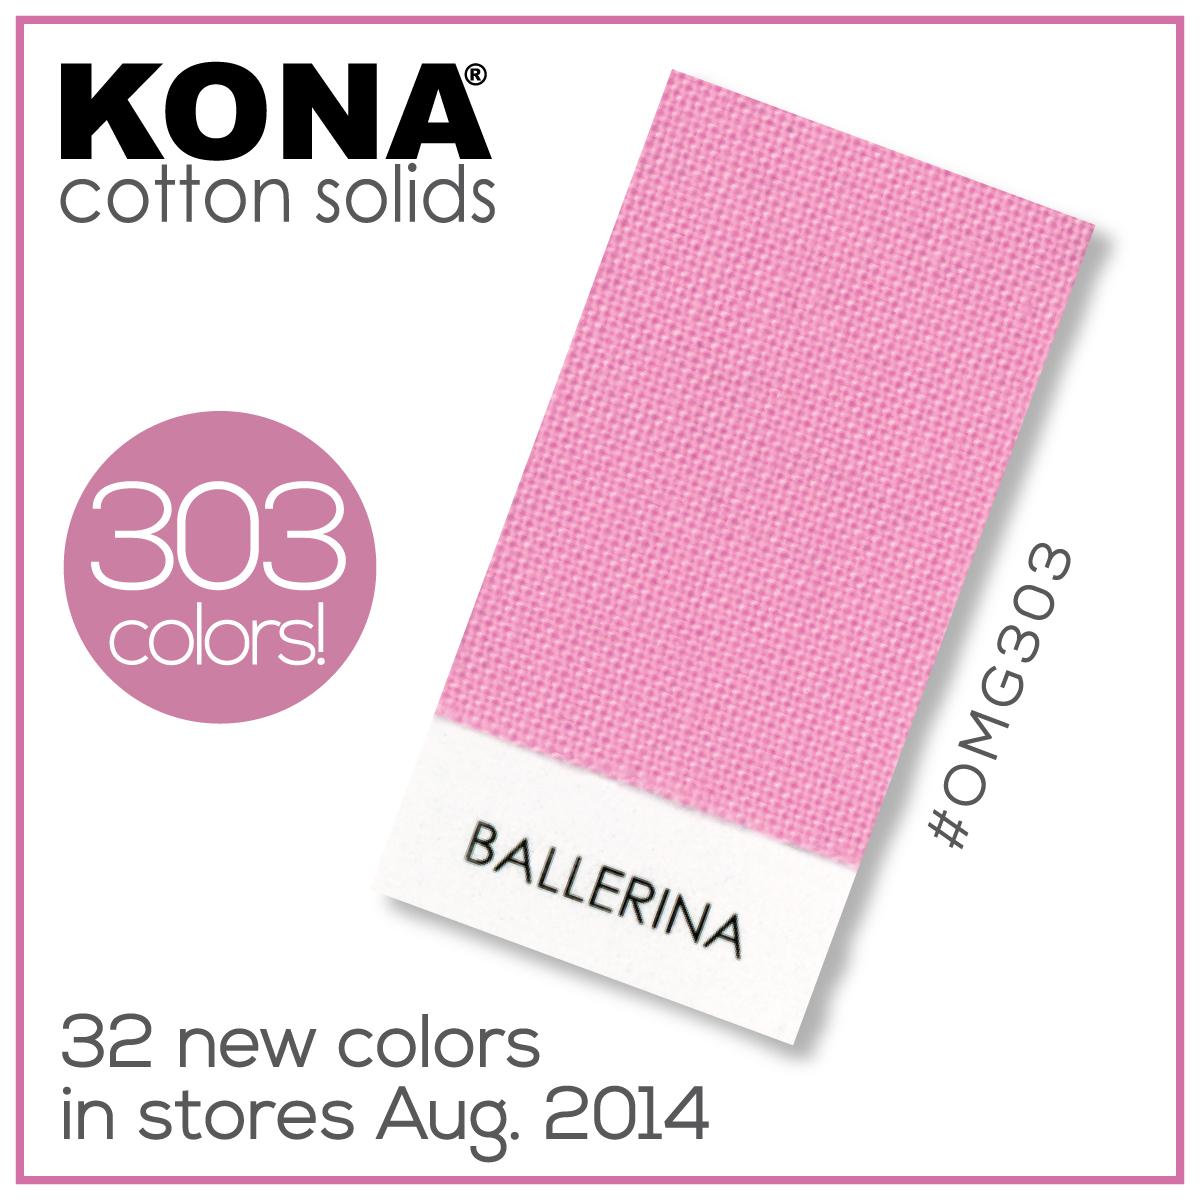 Kona-Ballerina.jpg